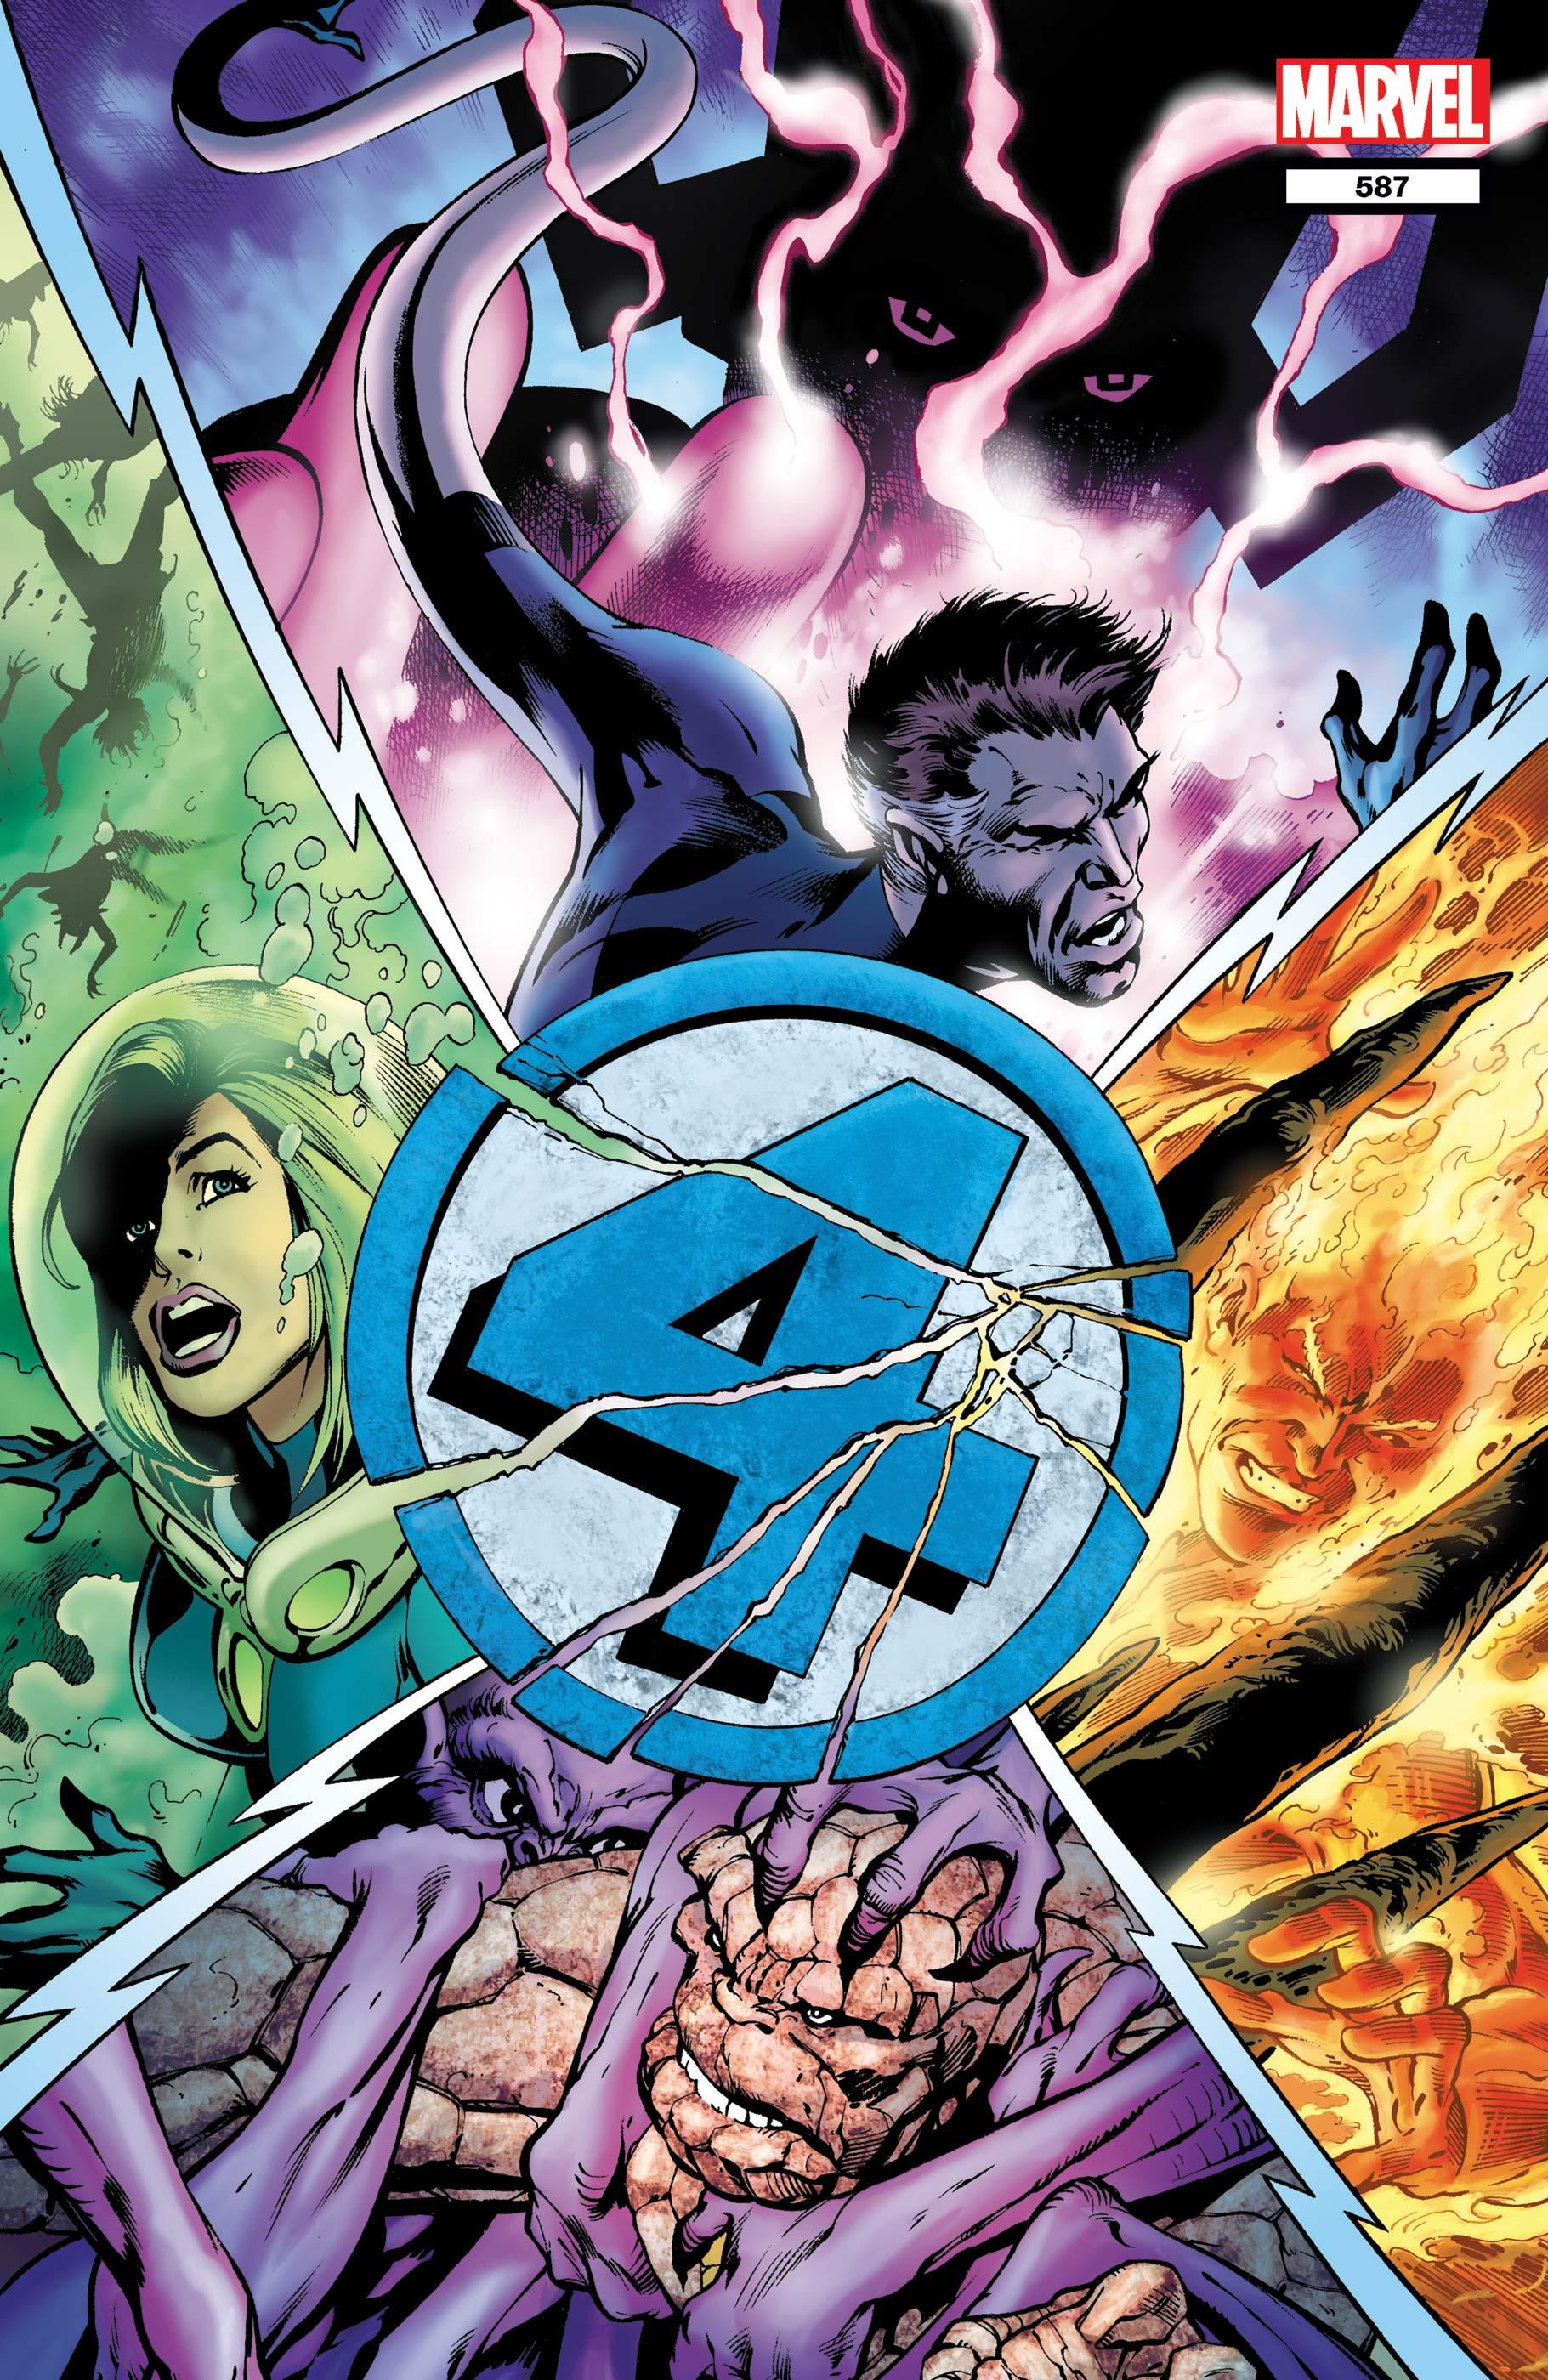 Fantastic Four (1998) #587